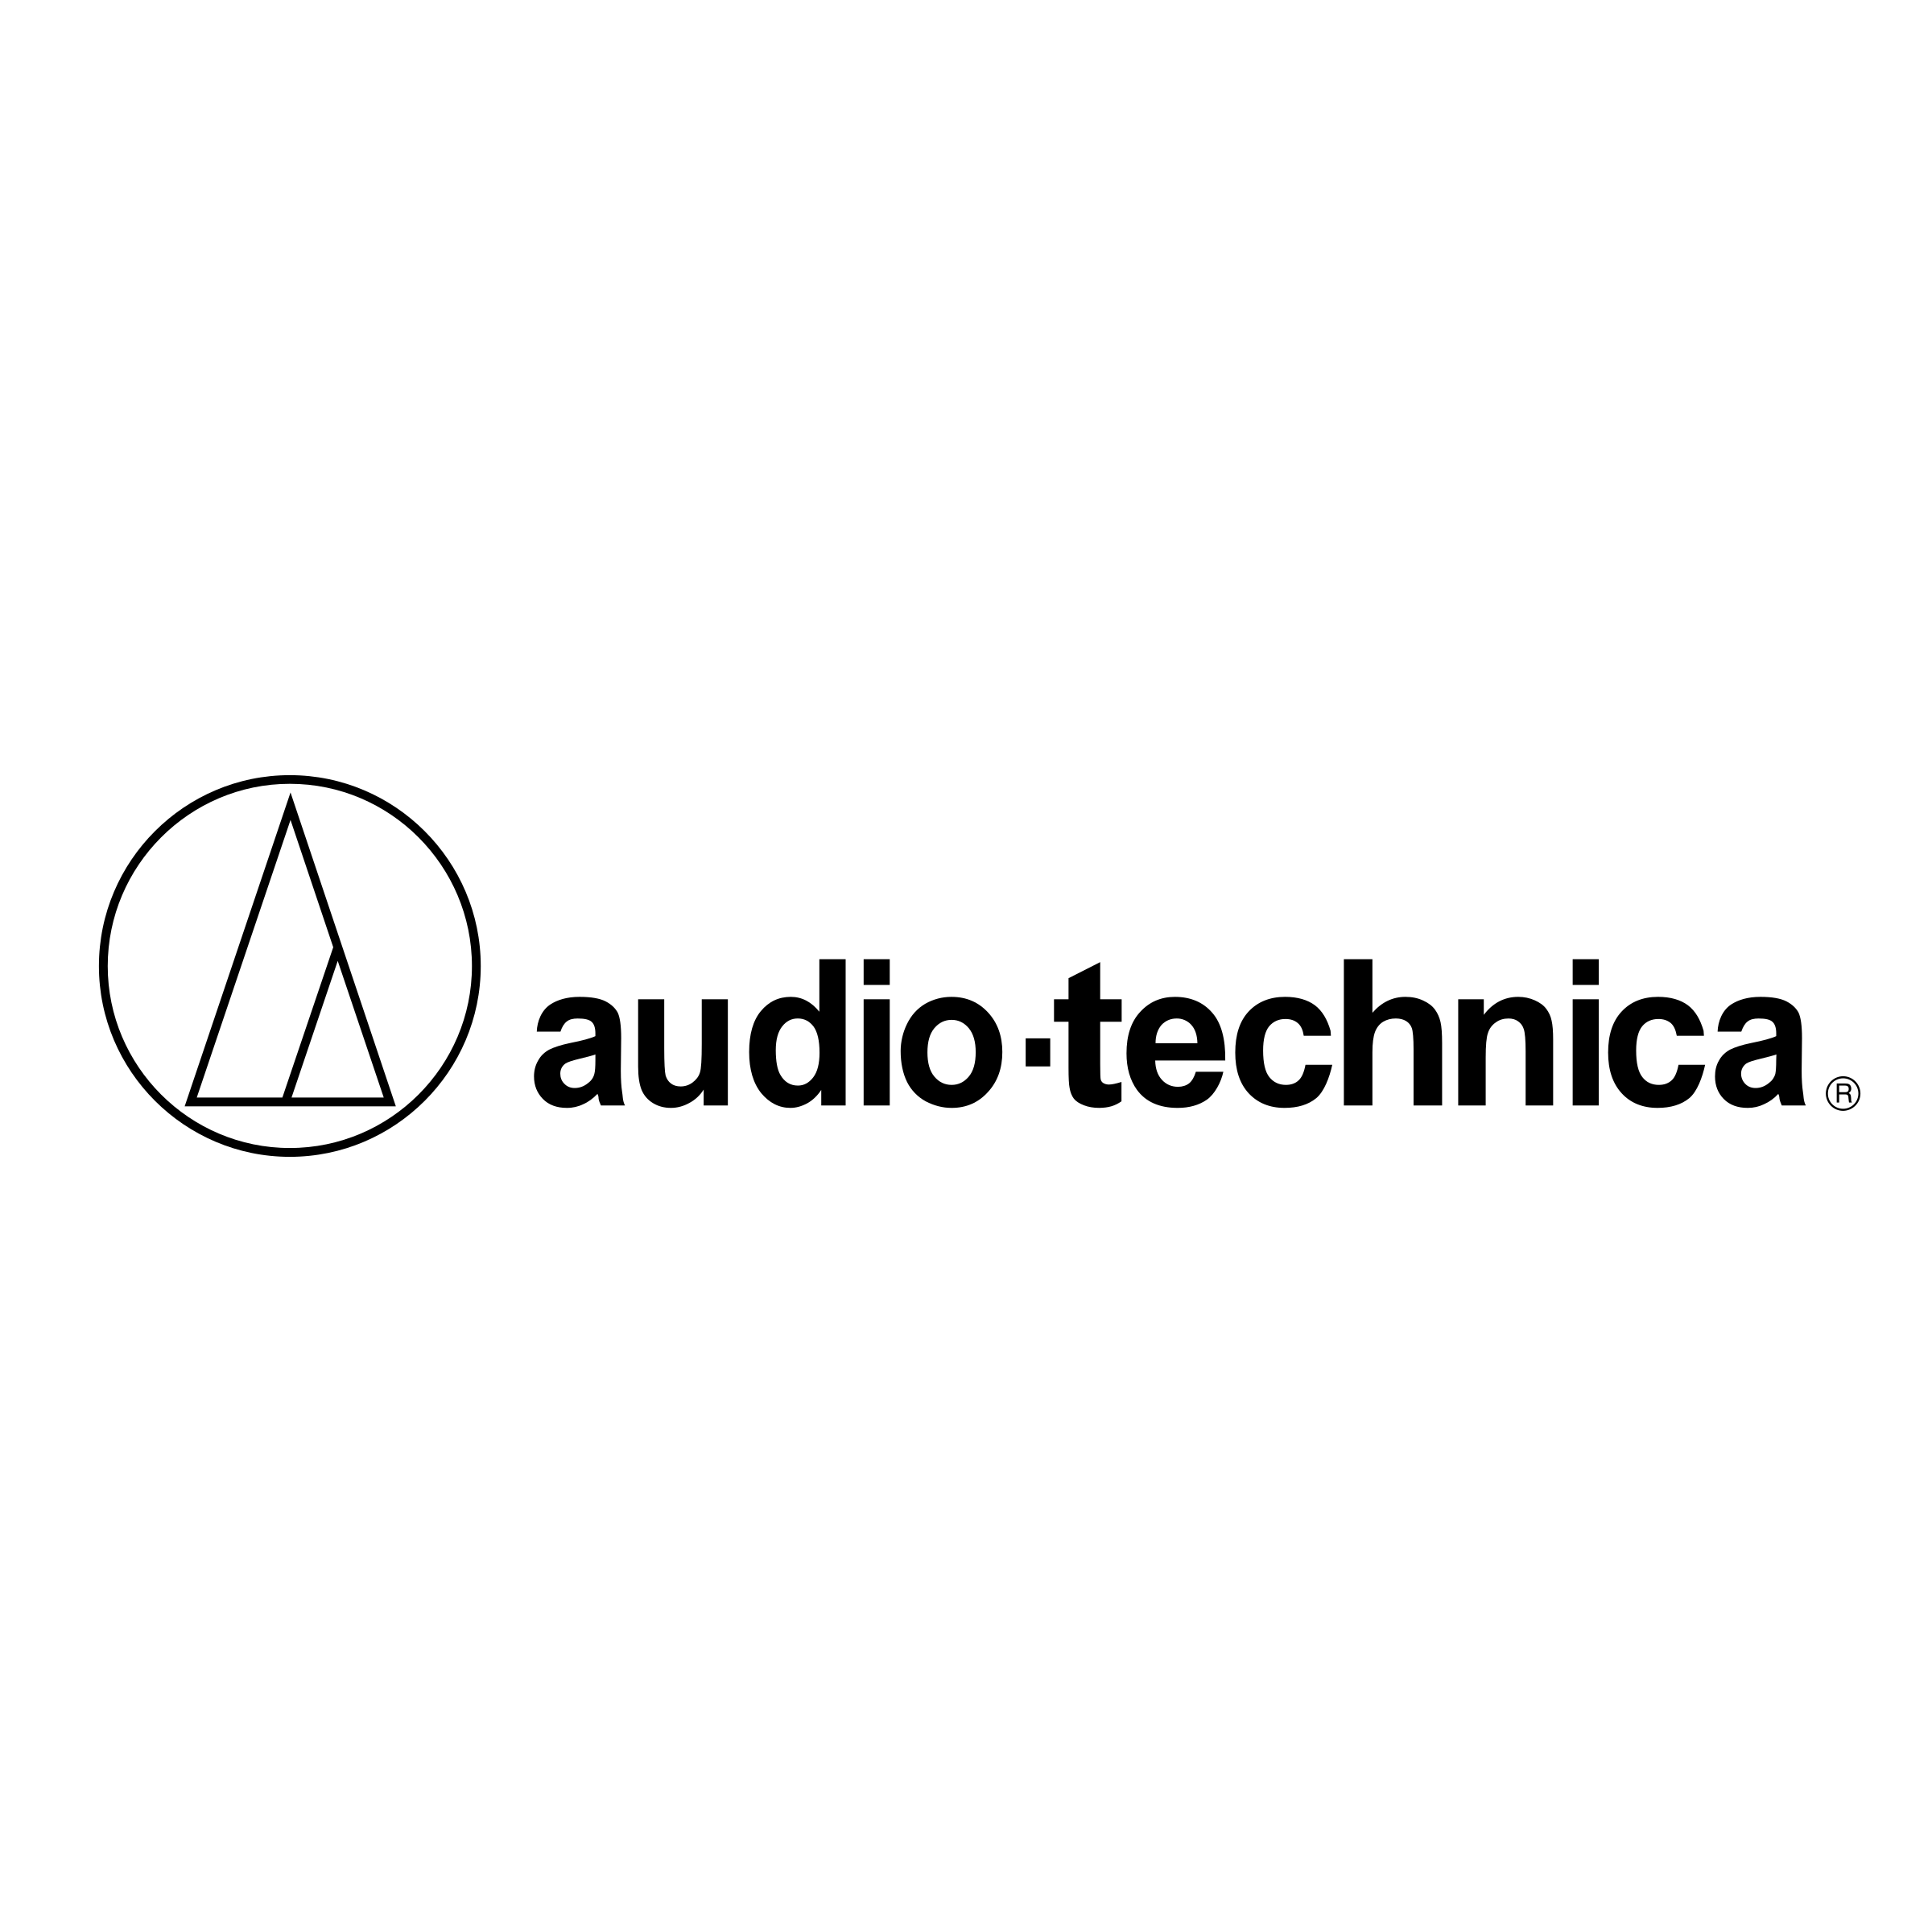 audio-technica-logo-png-transparent.png